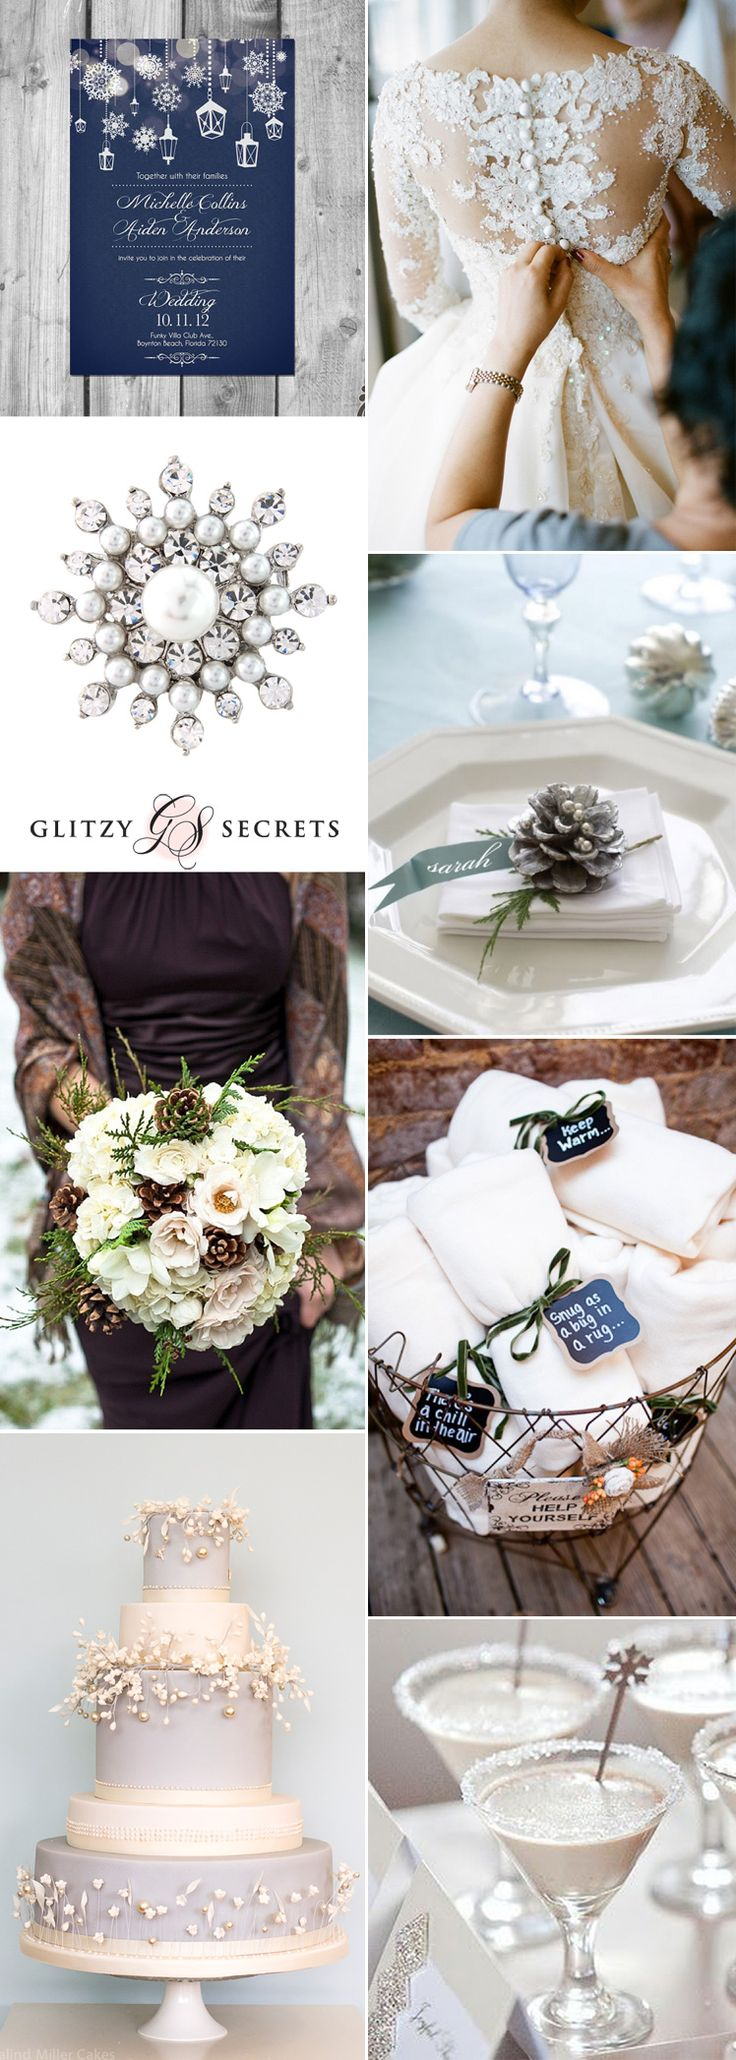 Top 10 Winter Wedding Color Combos 2016 | Winter weddings, Weddings ...